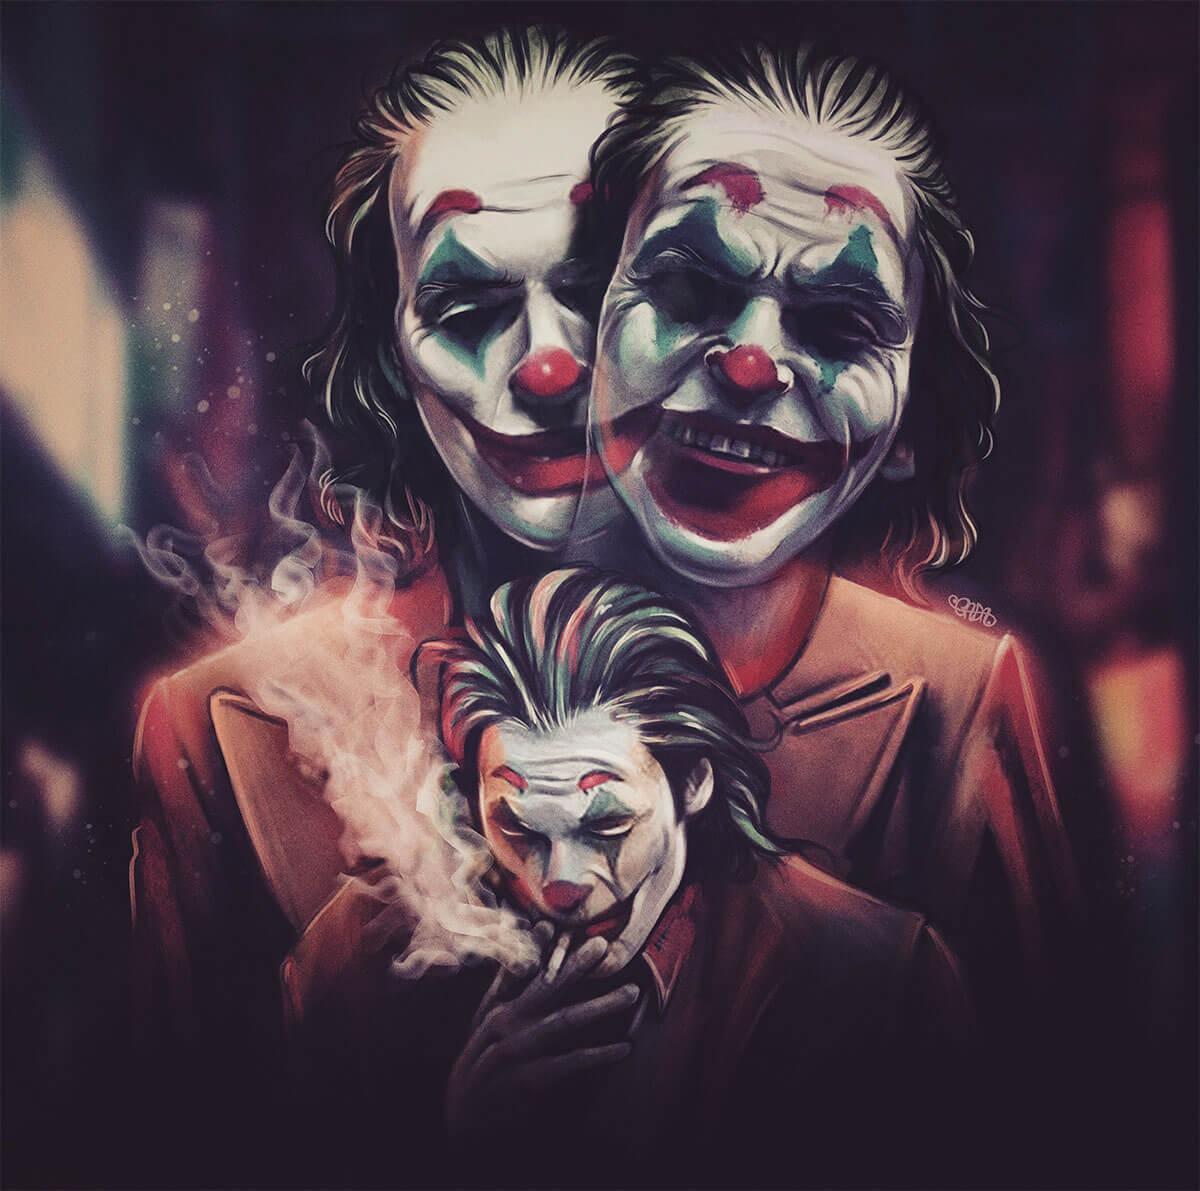 The Joker by Gada Jermy